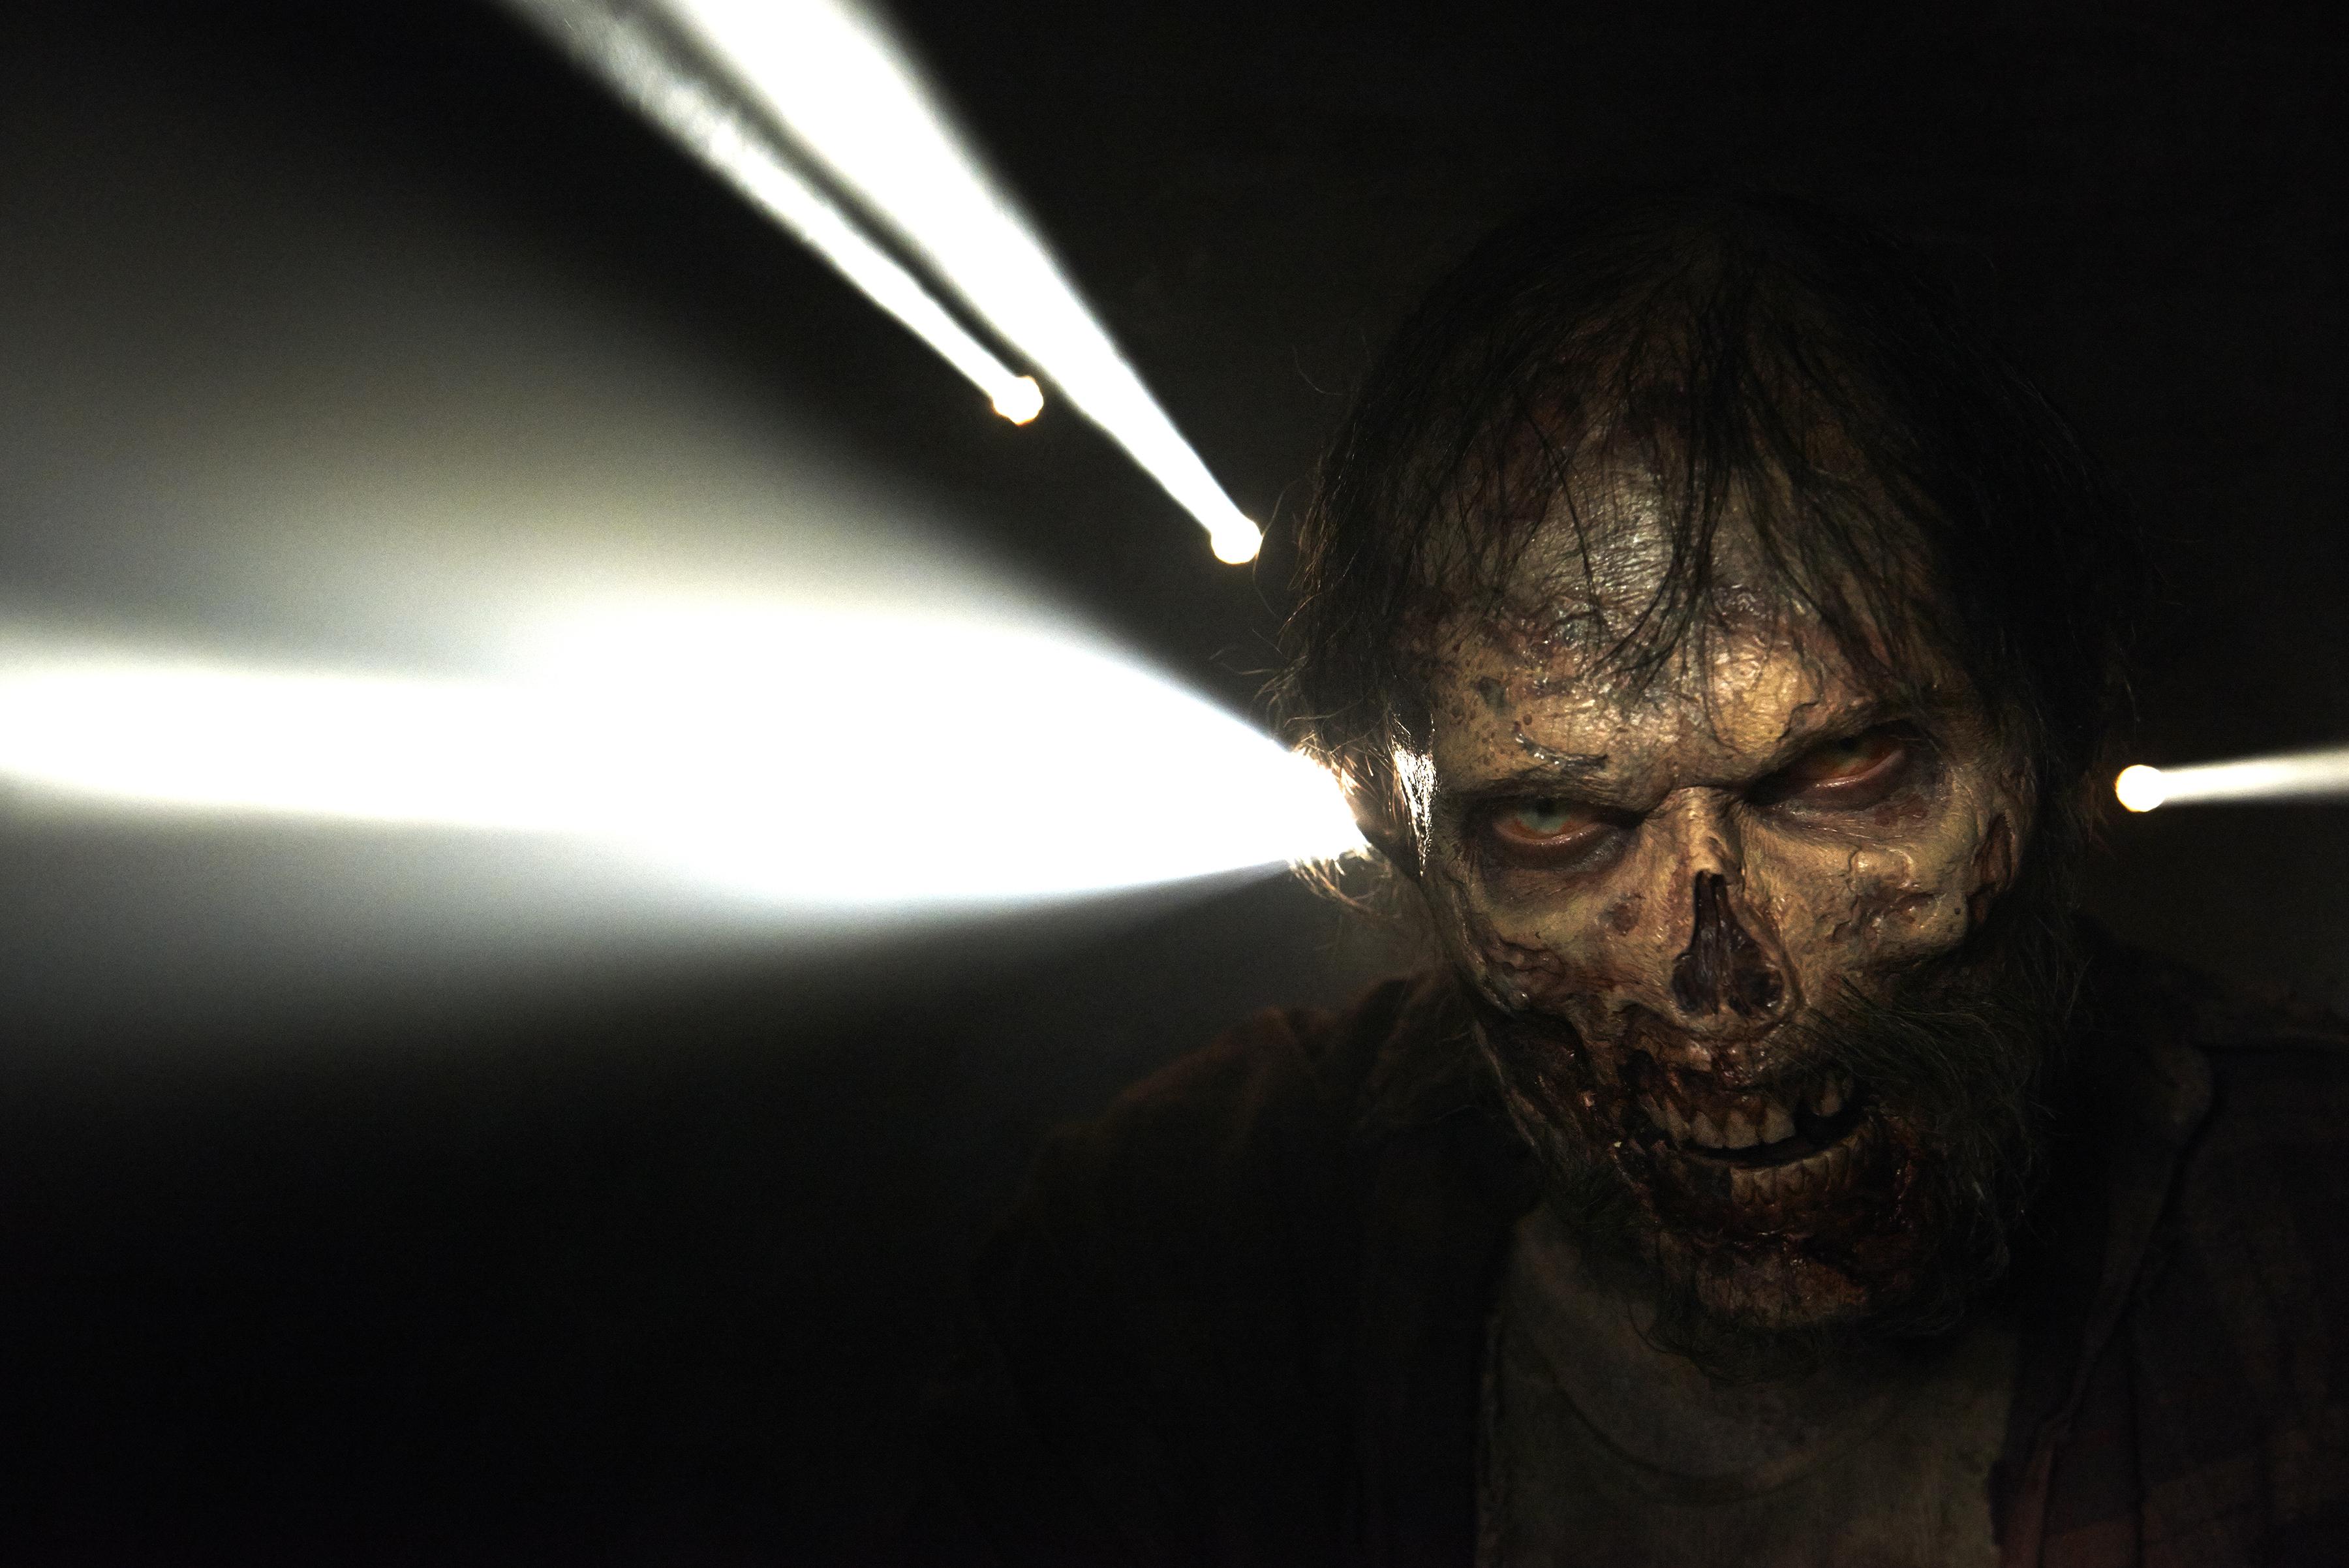 The Walking Dead Images The Walking Dead Season 5 Hd Wallpaper And